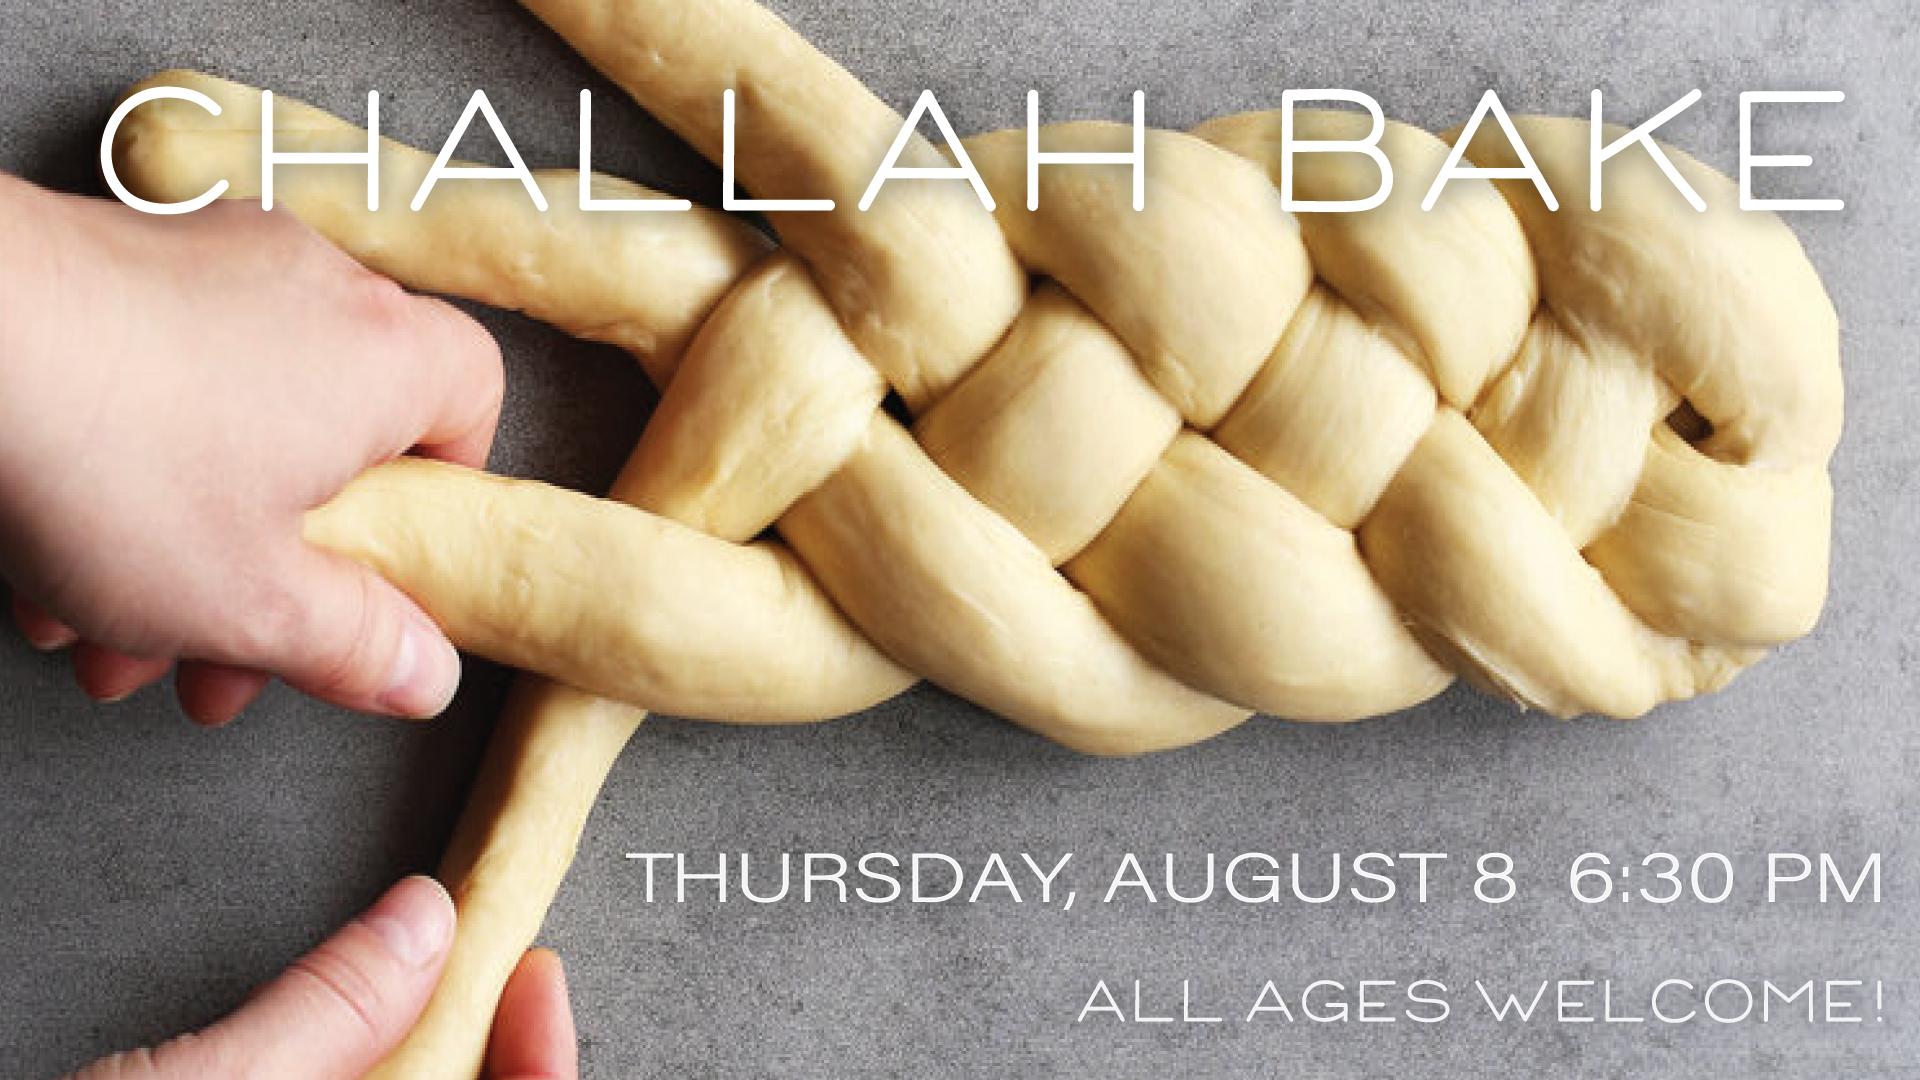 Challah Bake